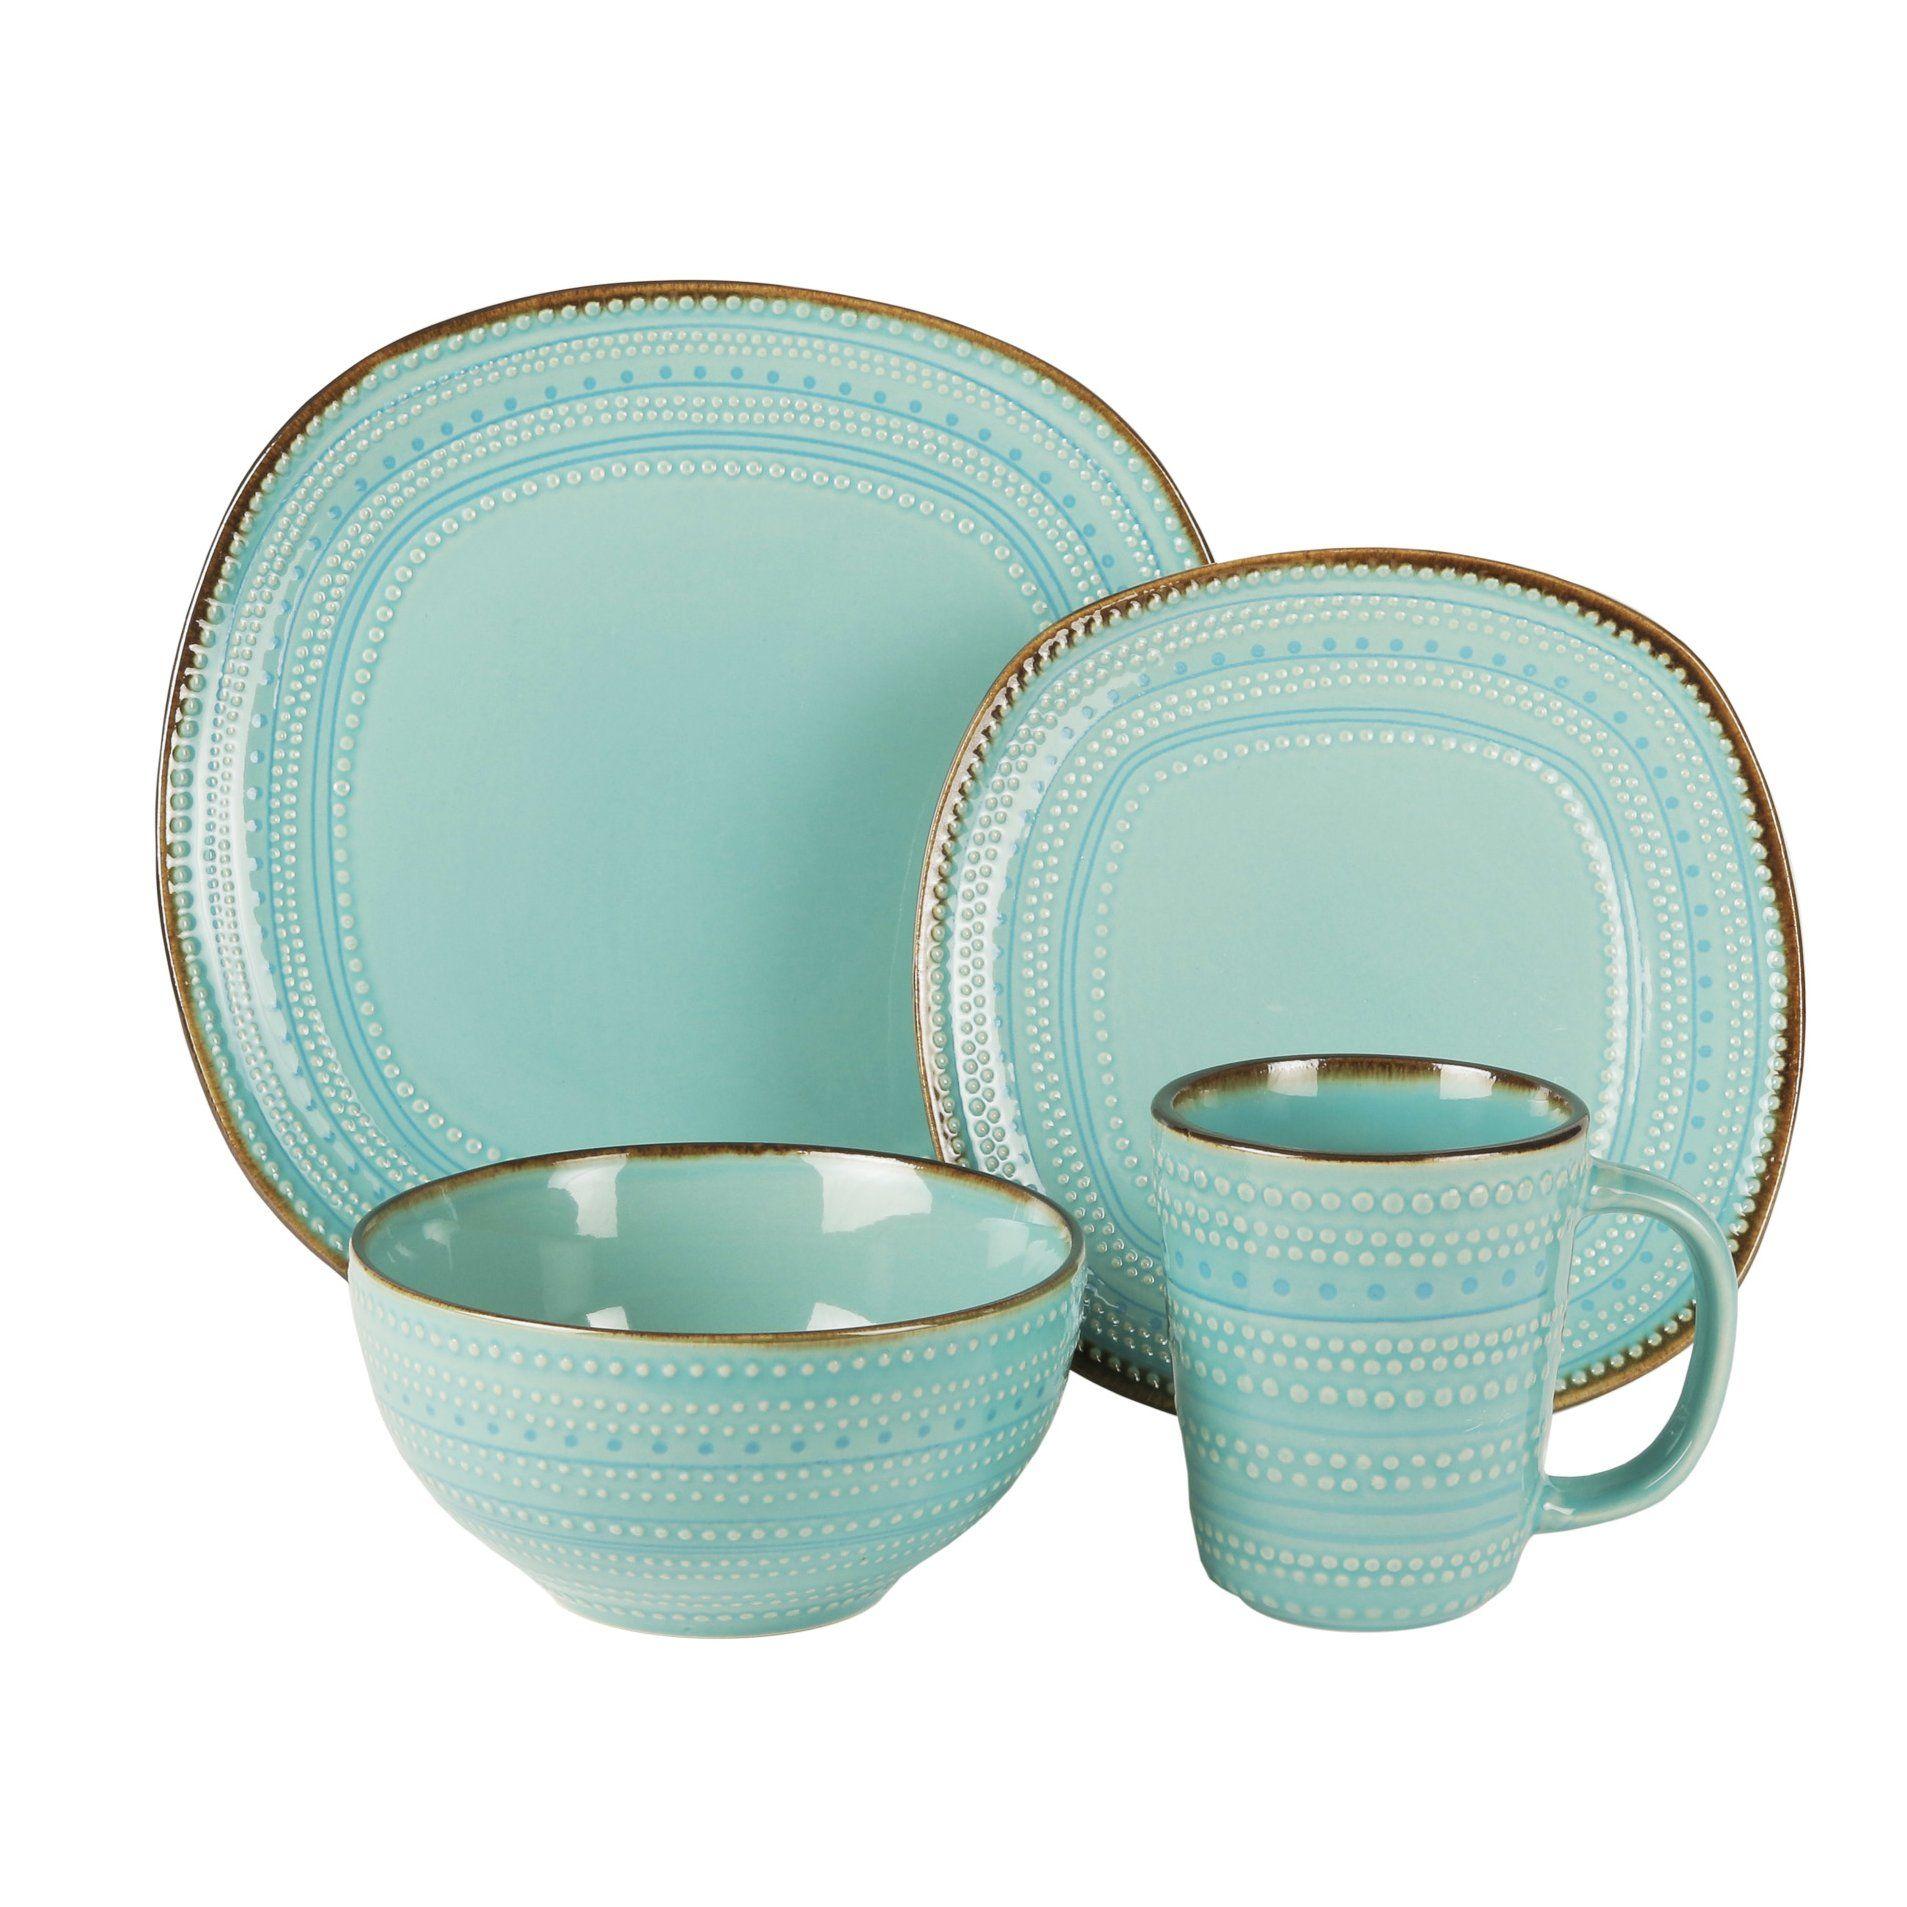 Bungalow Rose Preston 16 Piece Dinnerware Set | Artistry home ...